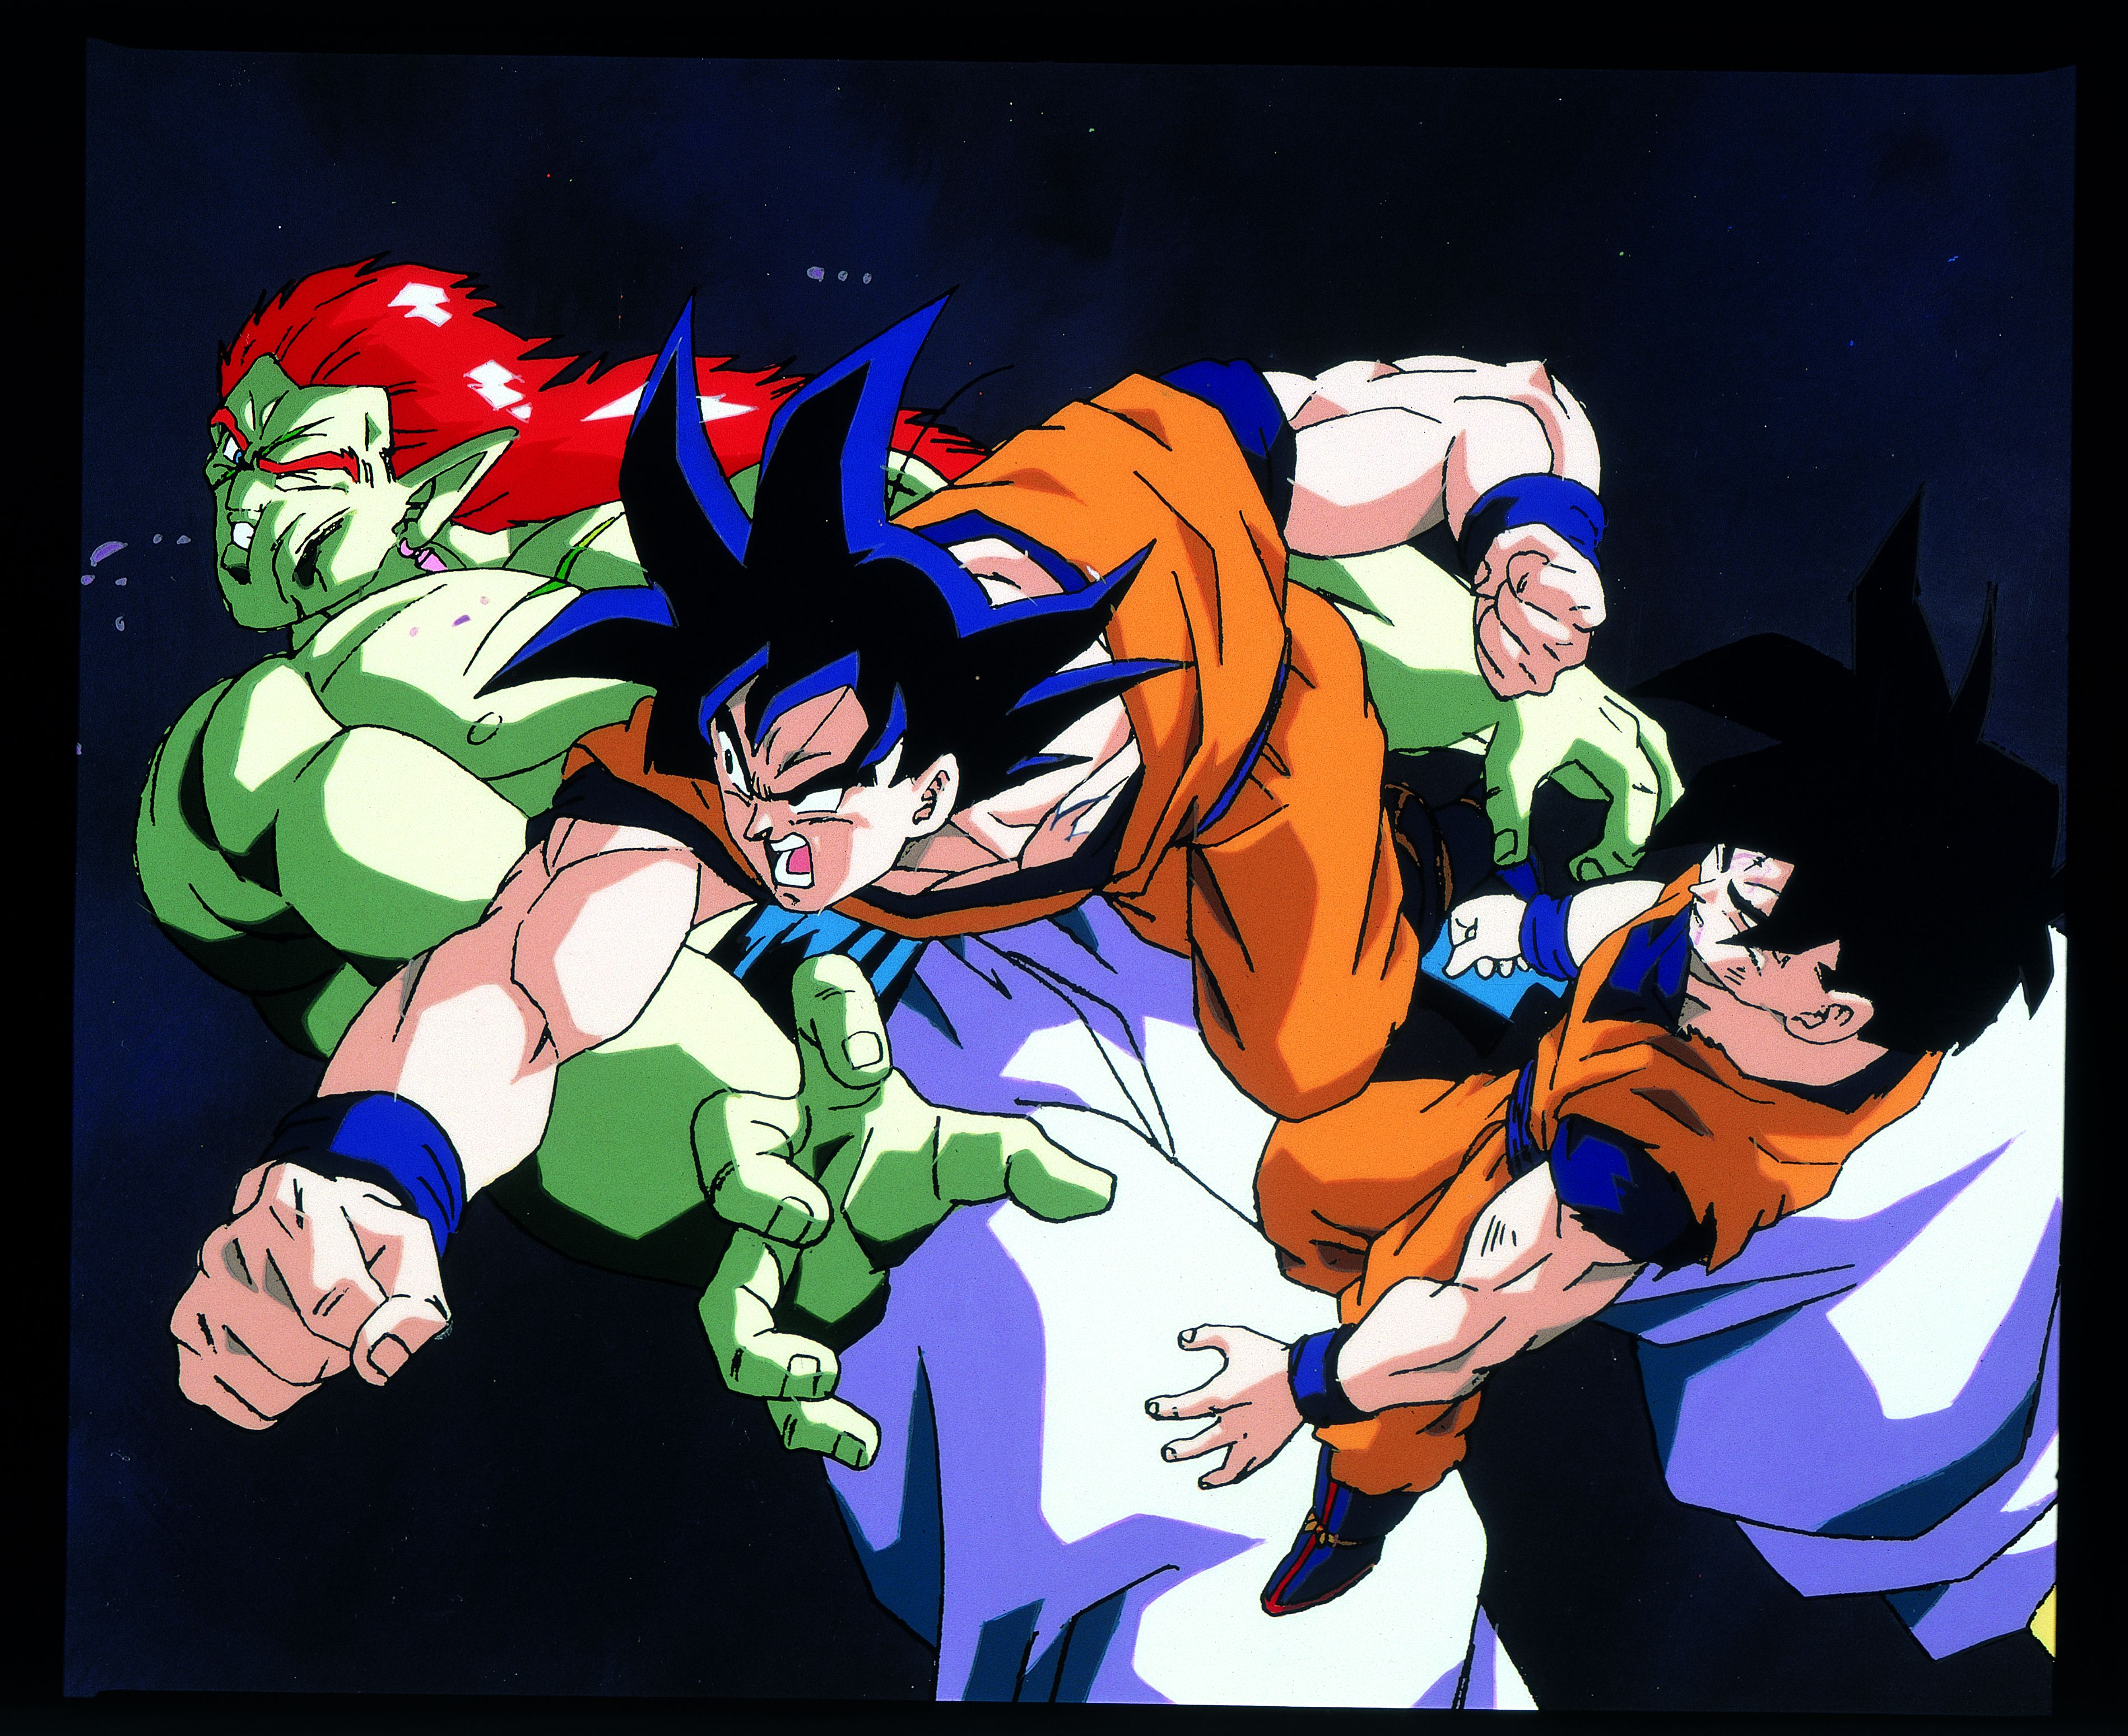 Dragon ball z movie collection 4 review anime rice - Dragon ball z 4 ...